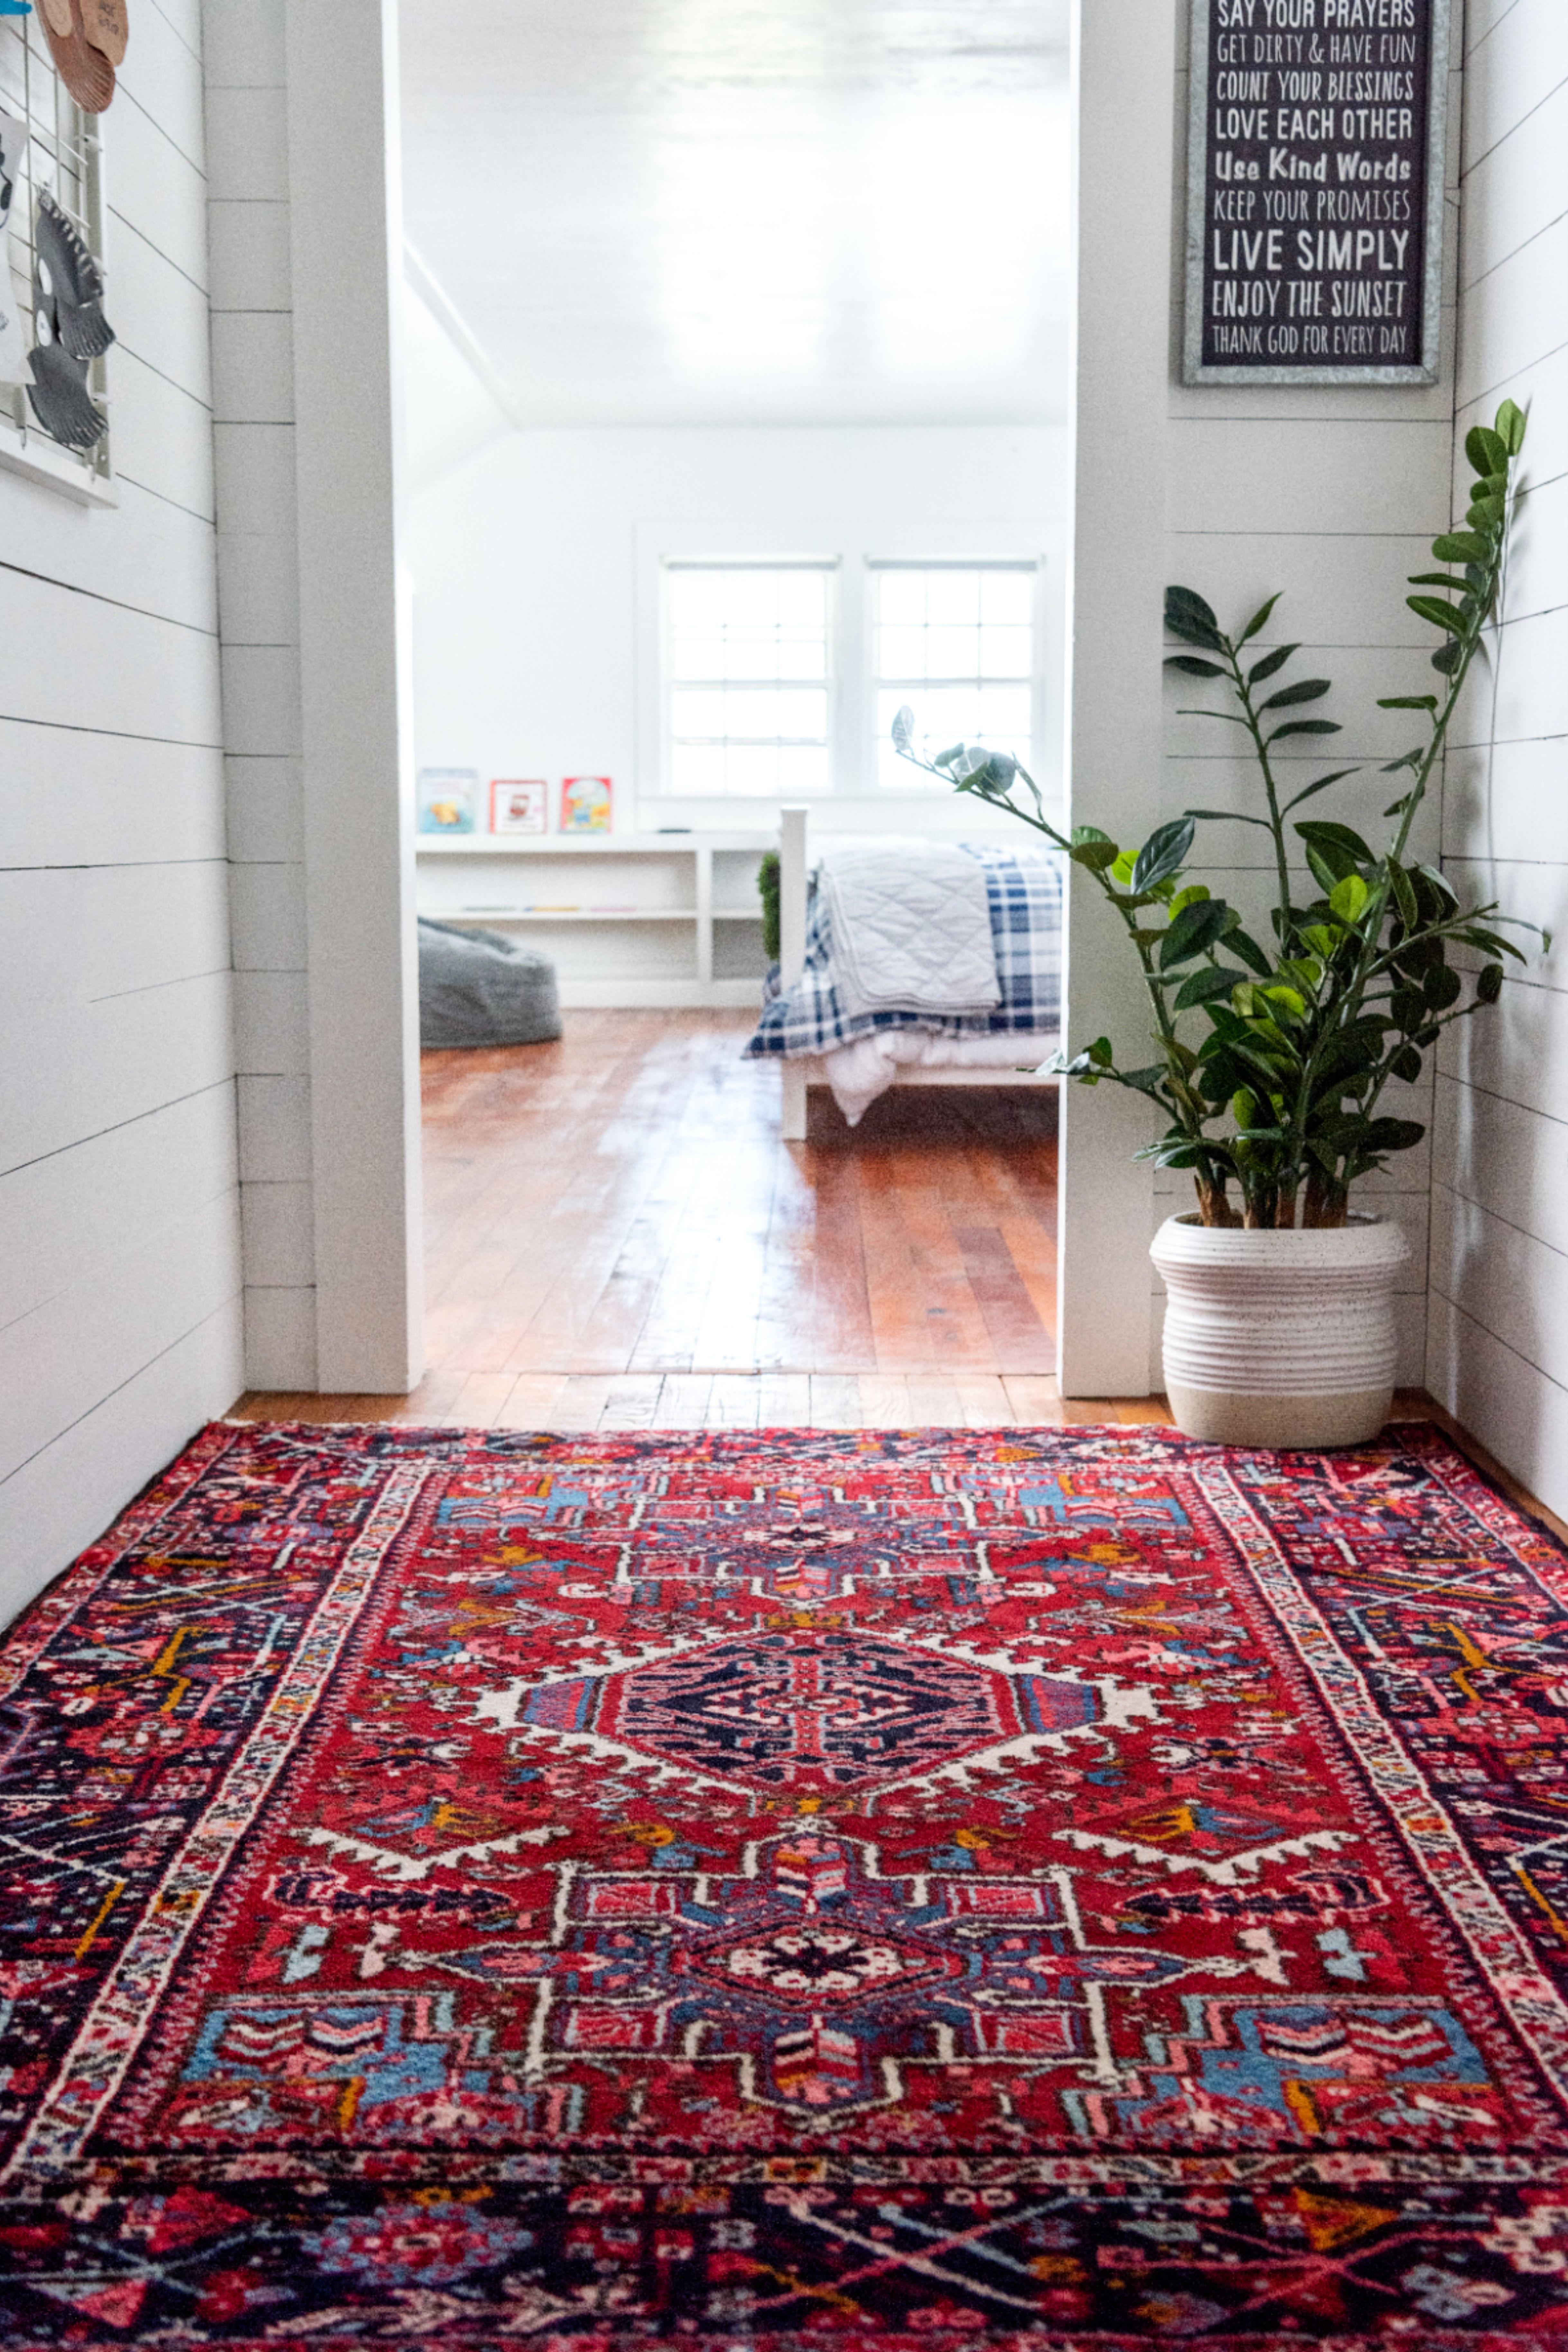 Perisan Rugs In 2020 Persian Rug Living Room Persian Rugs Decor Rugs In Living Room #persian #rug #modern #living #room